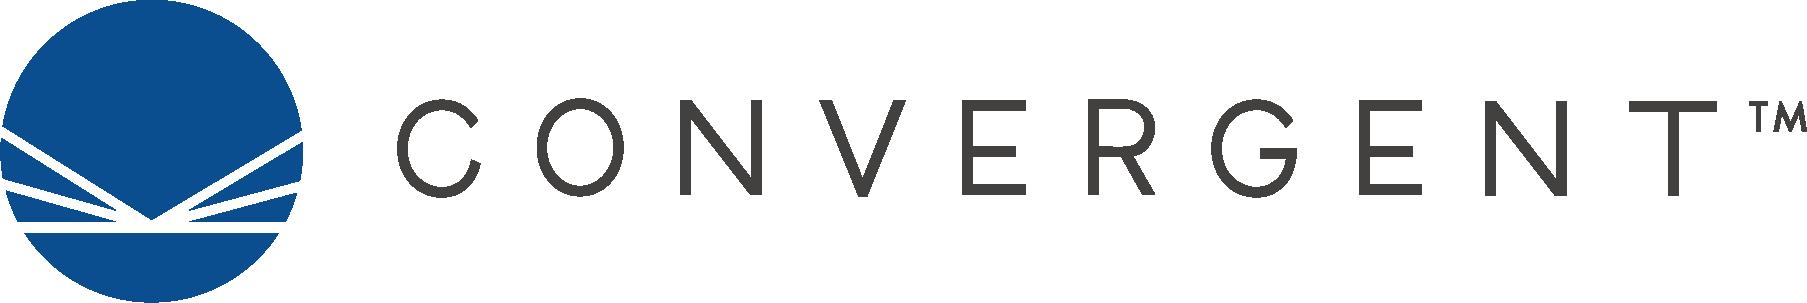 CVG-Logo-TM.png